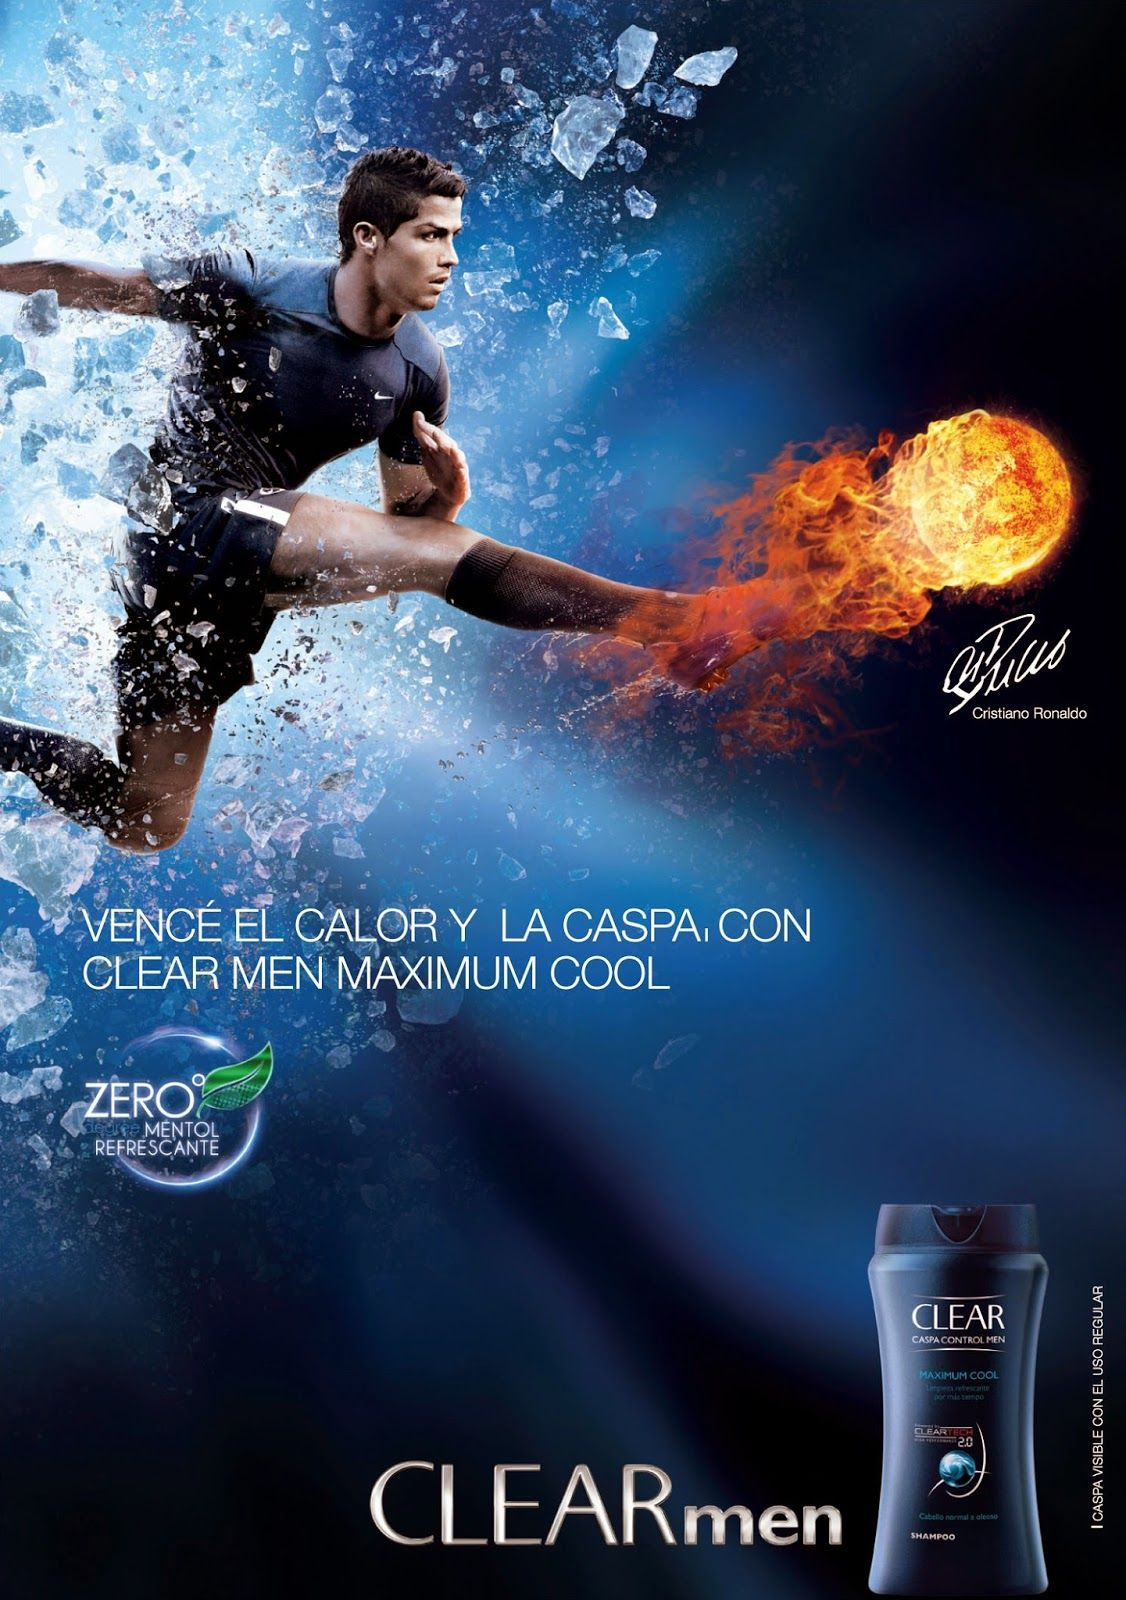 530 Koleksi Gambar Cristiano Ronaldo Paling Keren Terbaru